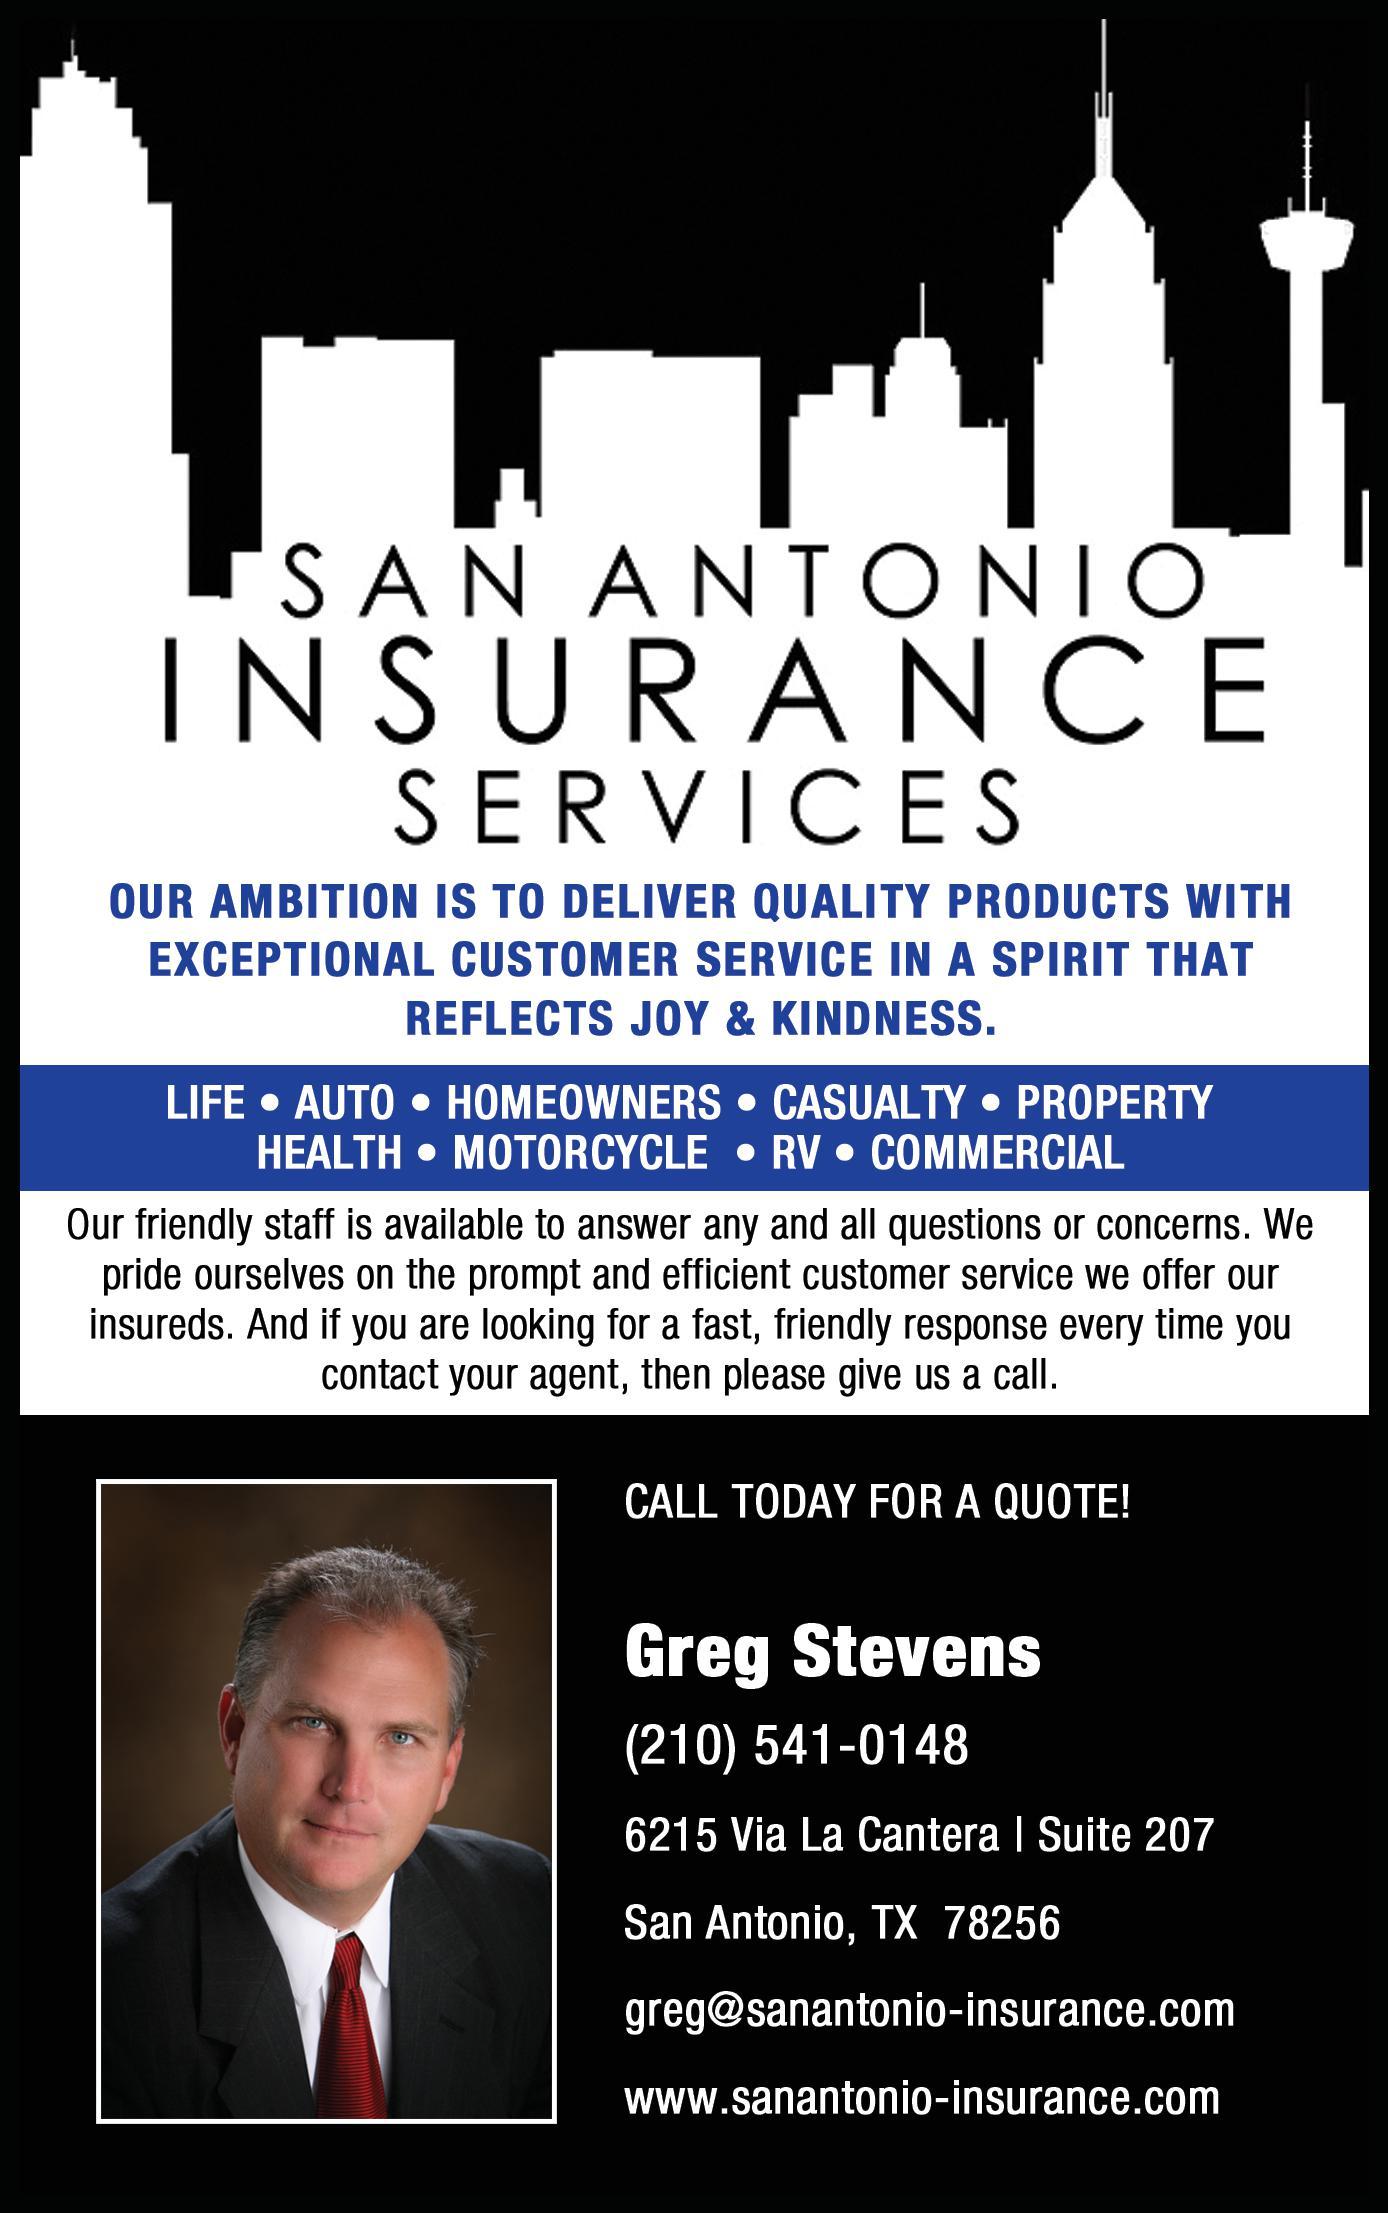 San Antonio Insurance Services, LLC